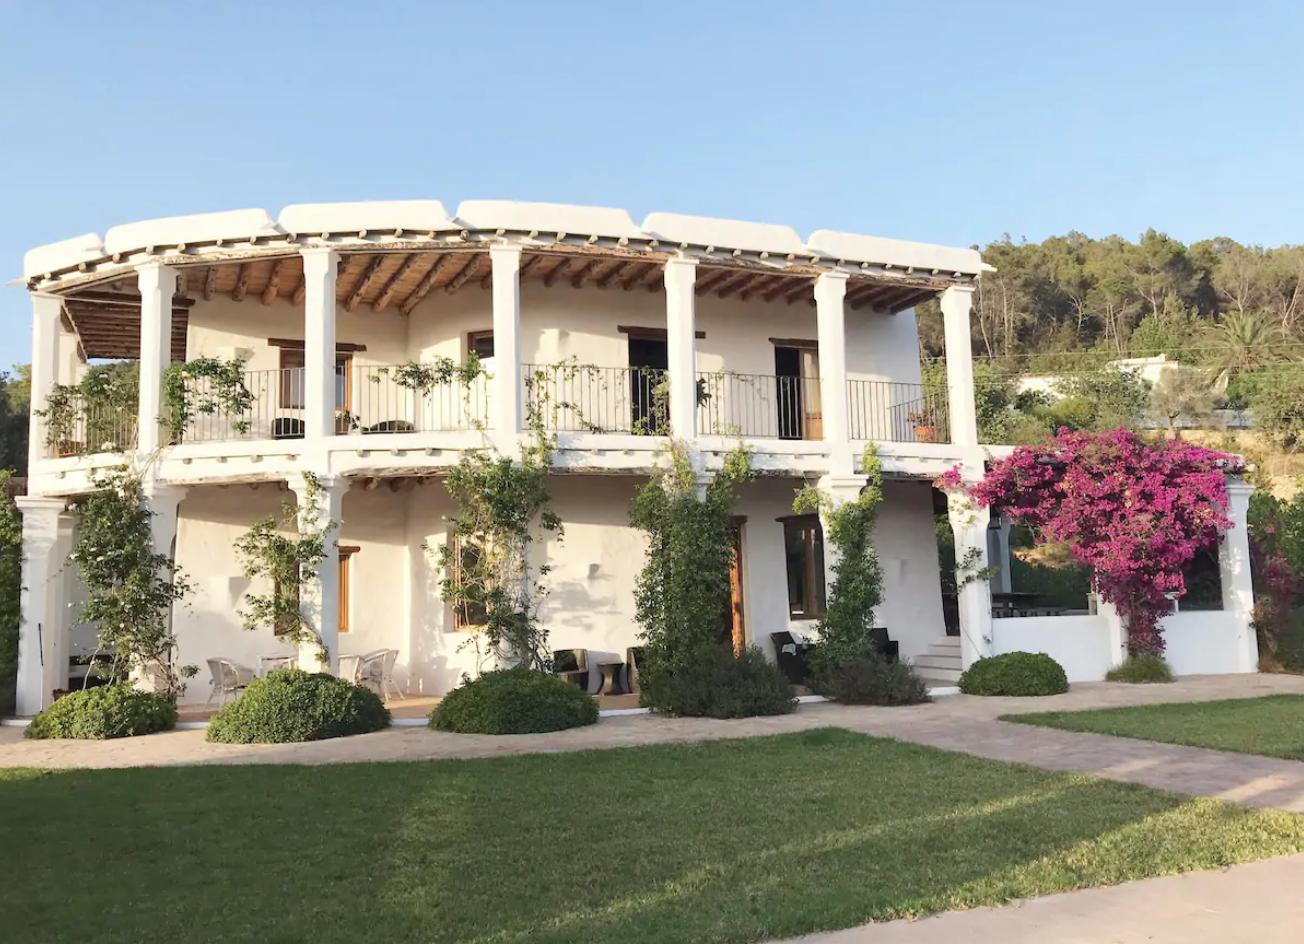 Luxury Villa in Sant Joan de Labritja, Sant LLorenc de Balafia, holiday rentals